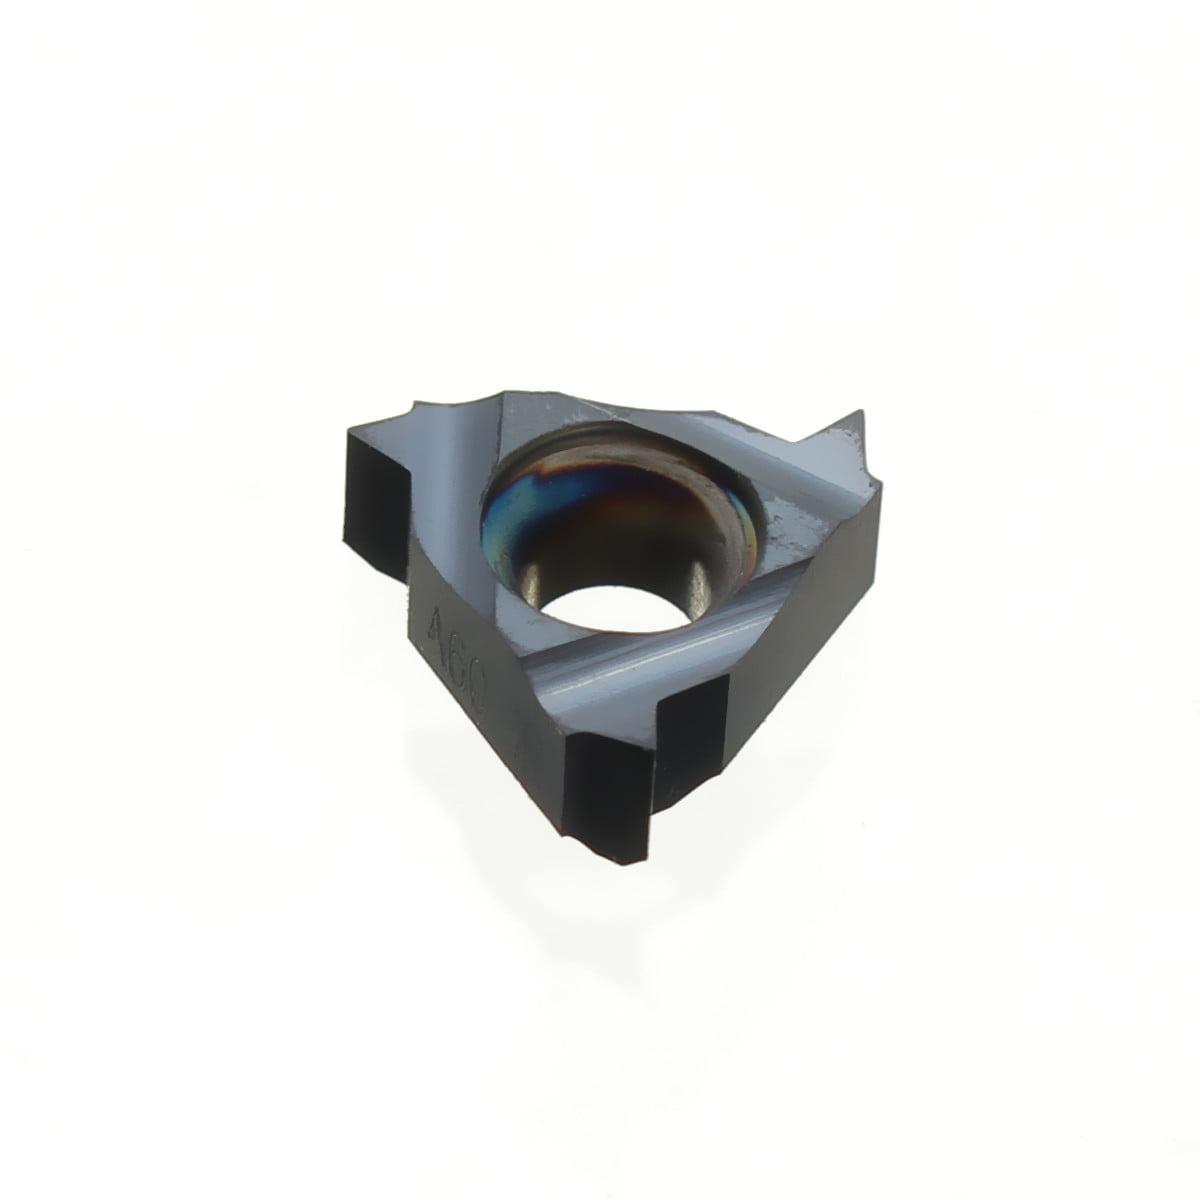 "1x 11 IR A60 11IR A60 11 IR  A60 1//4 /"" Carbide Insert For Threading Turning Tool"